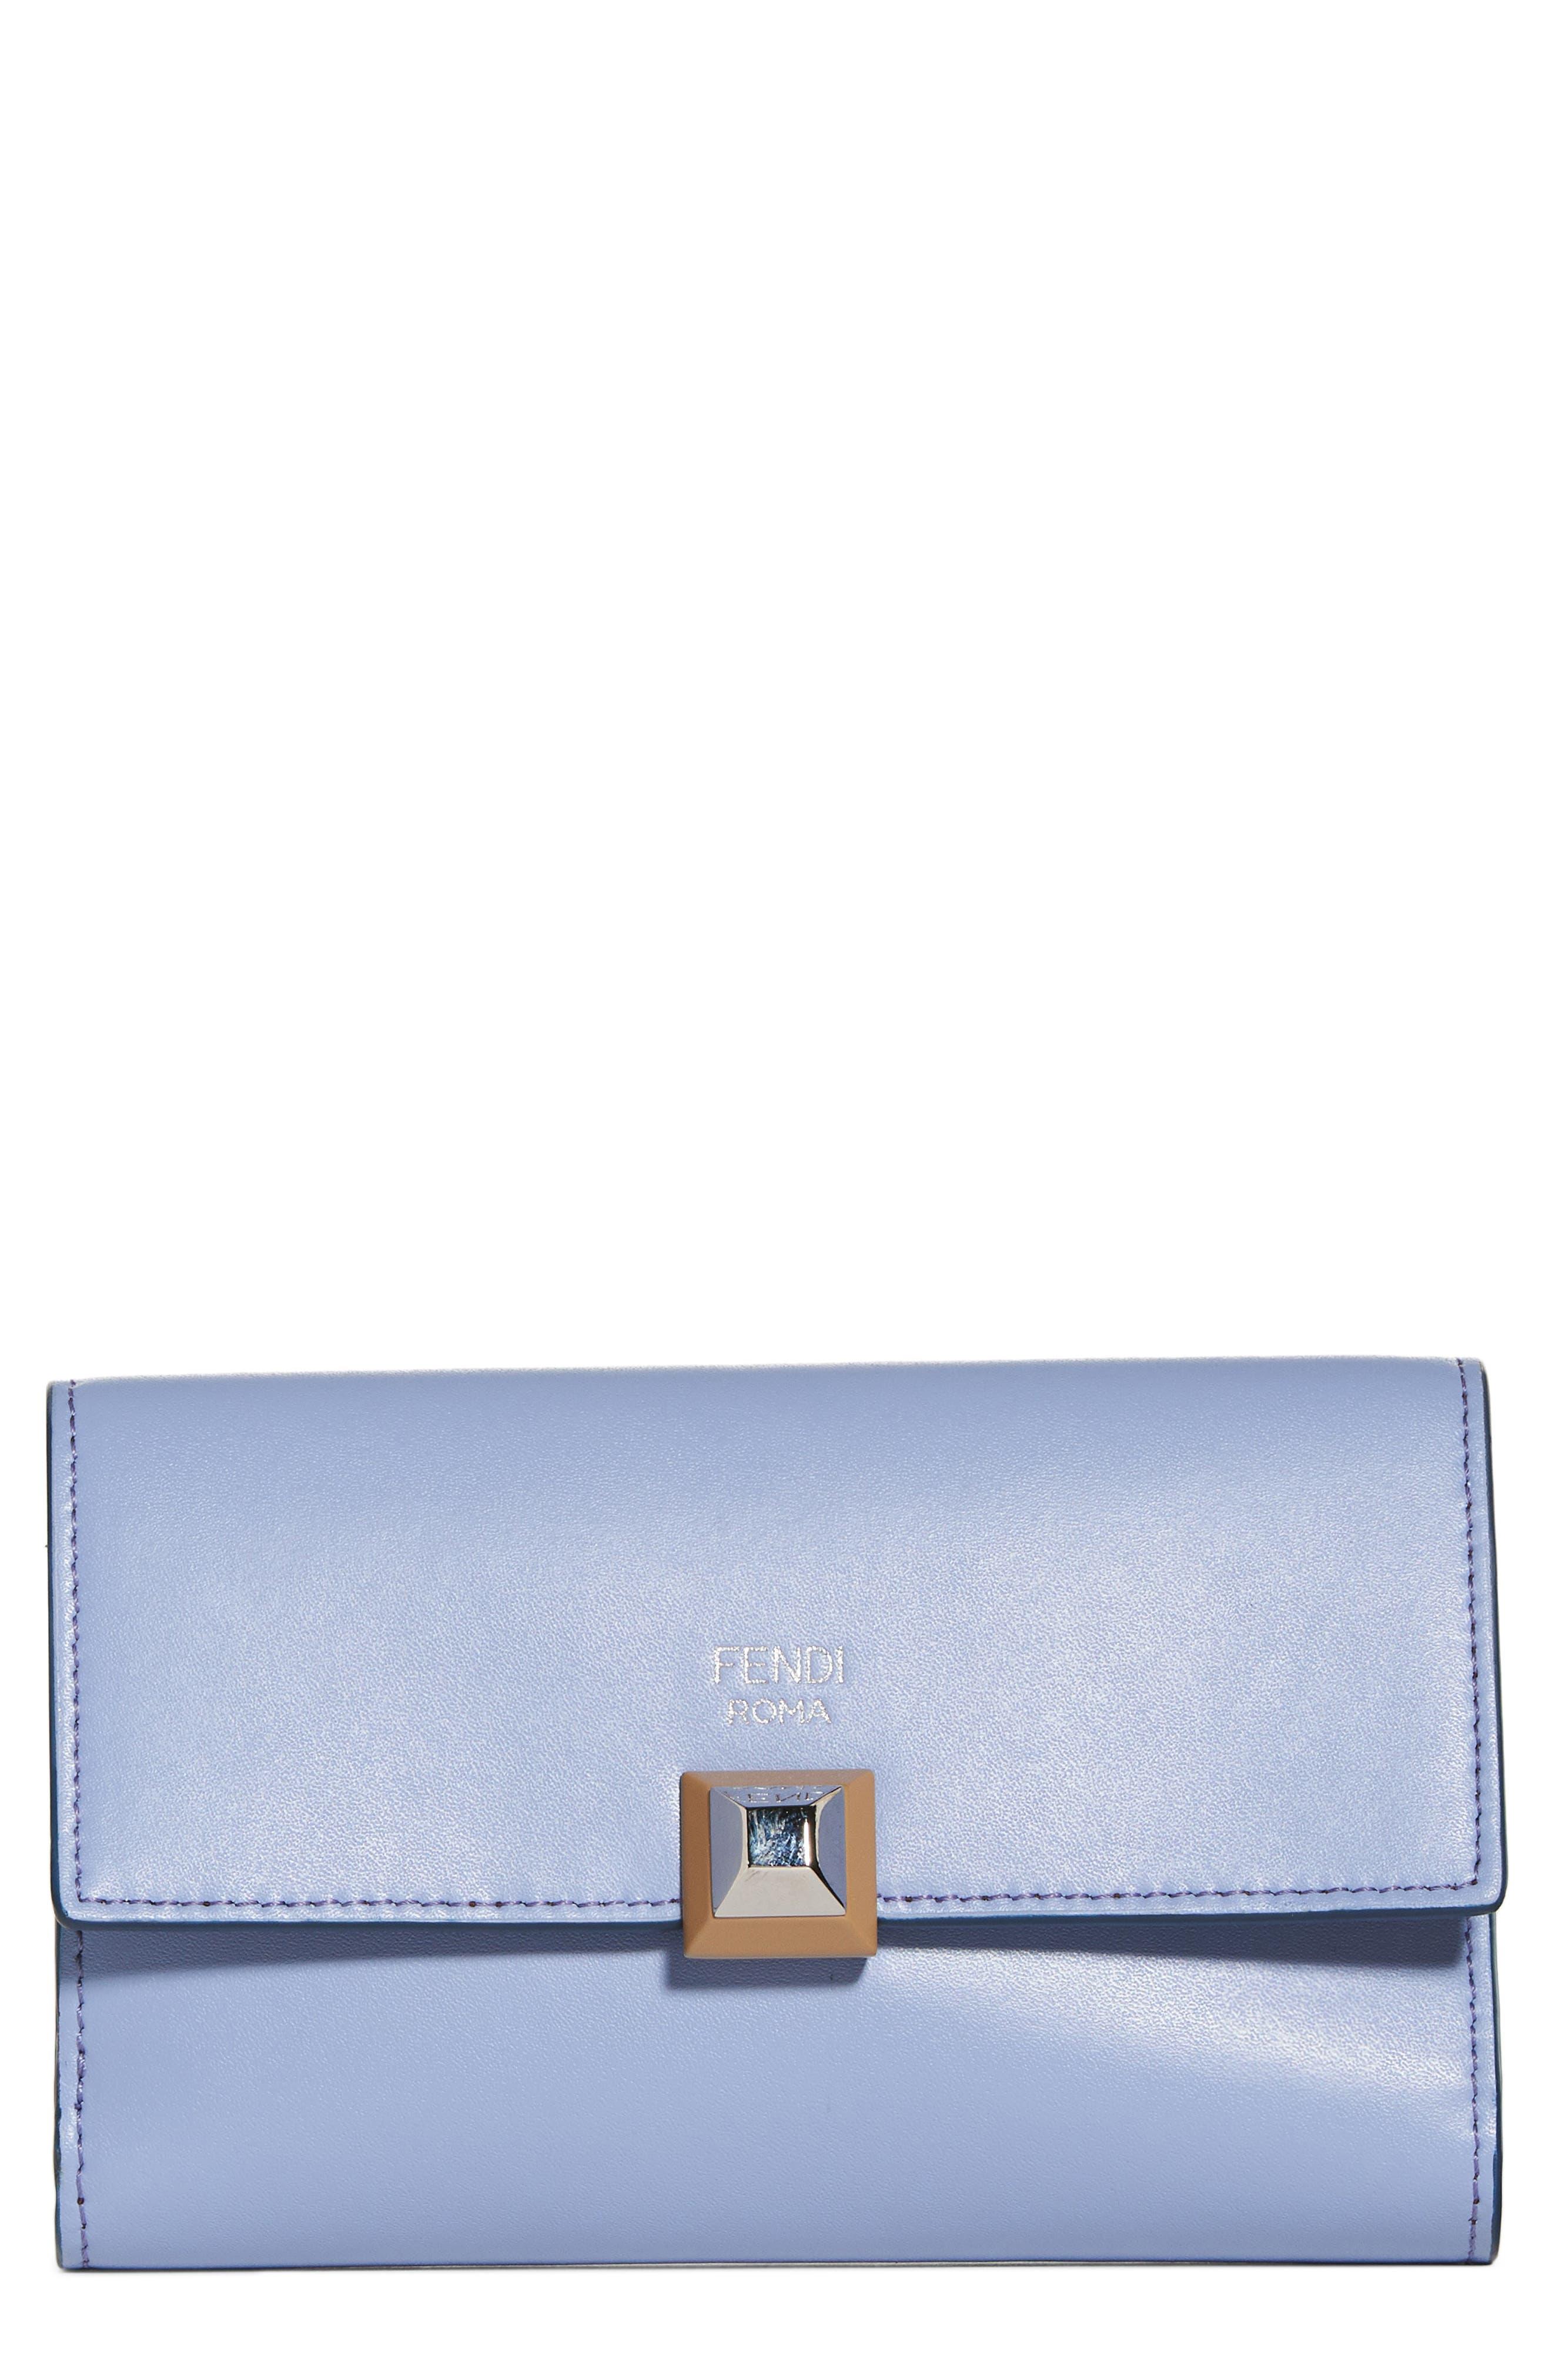 Fendi Medium Leather Wallet